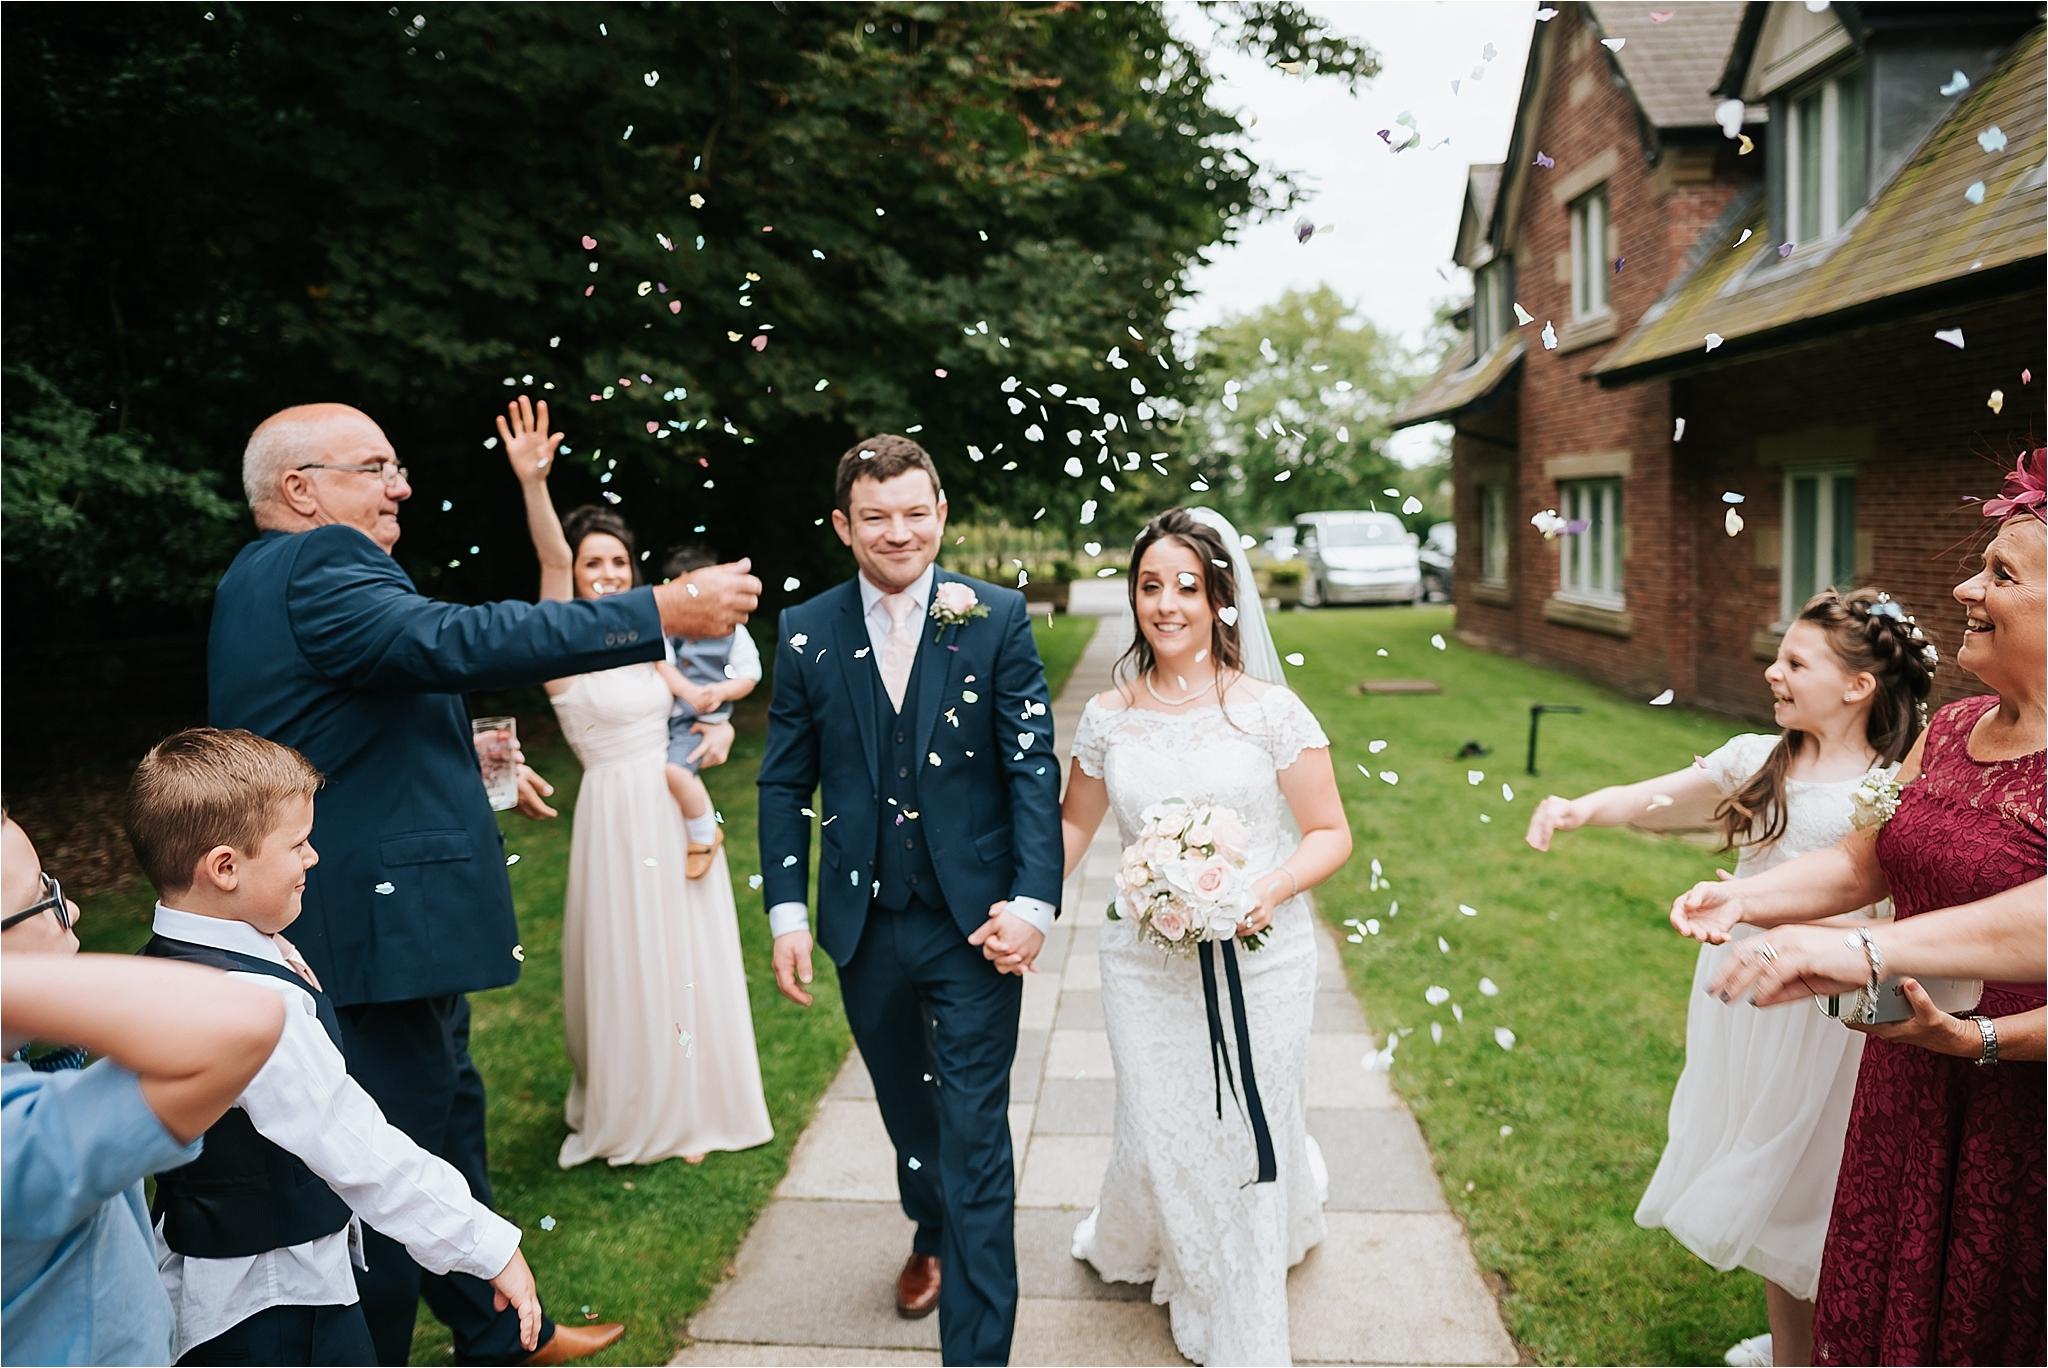 thevilla+lancashire+wreagreen+wedding+photographer99.jpg